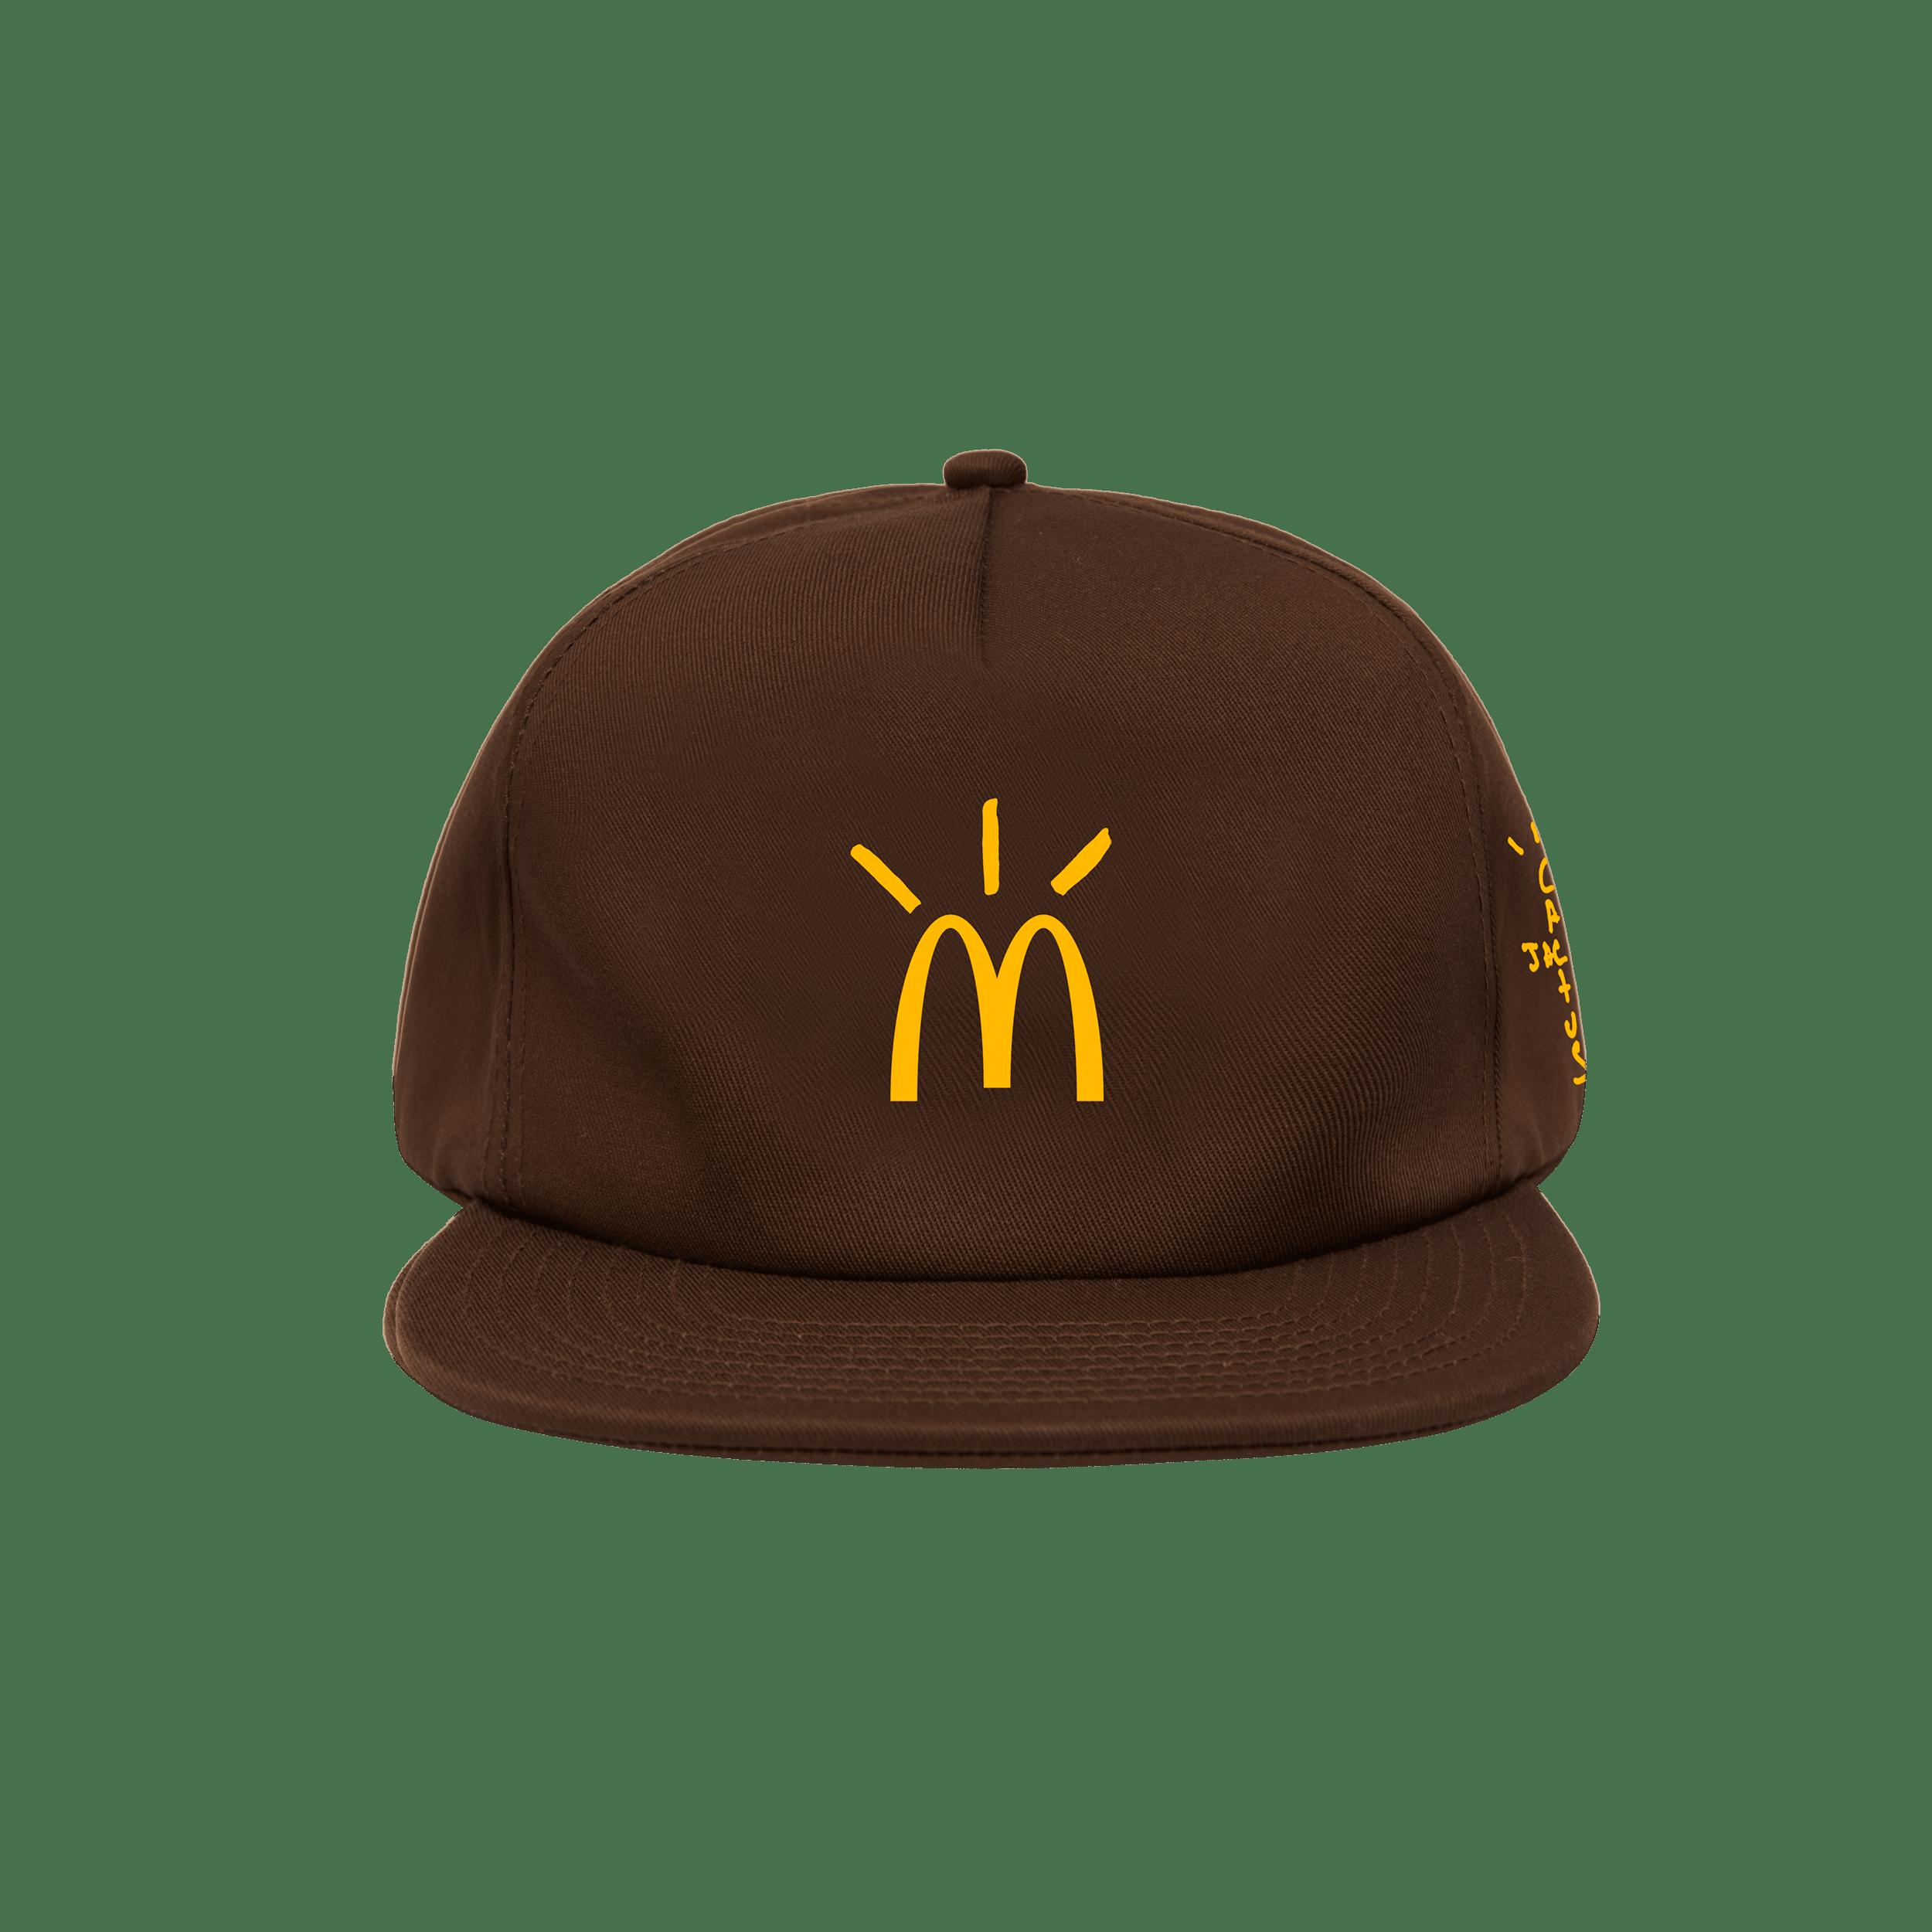 travis-scott-mcdonalds-merch-9